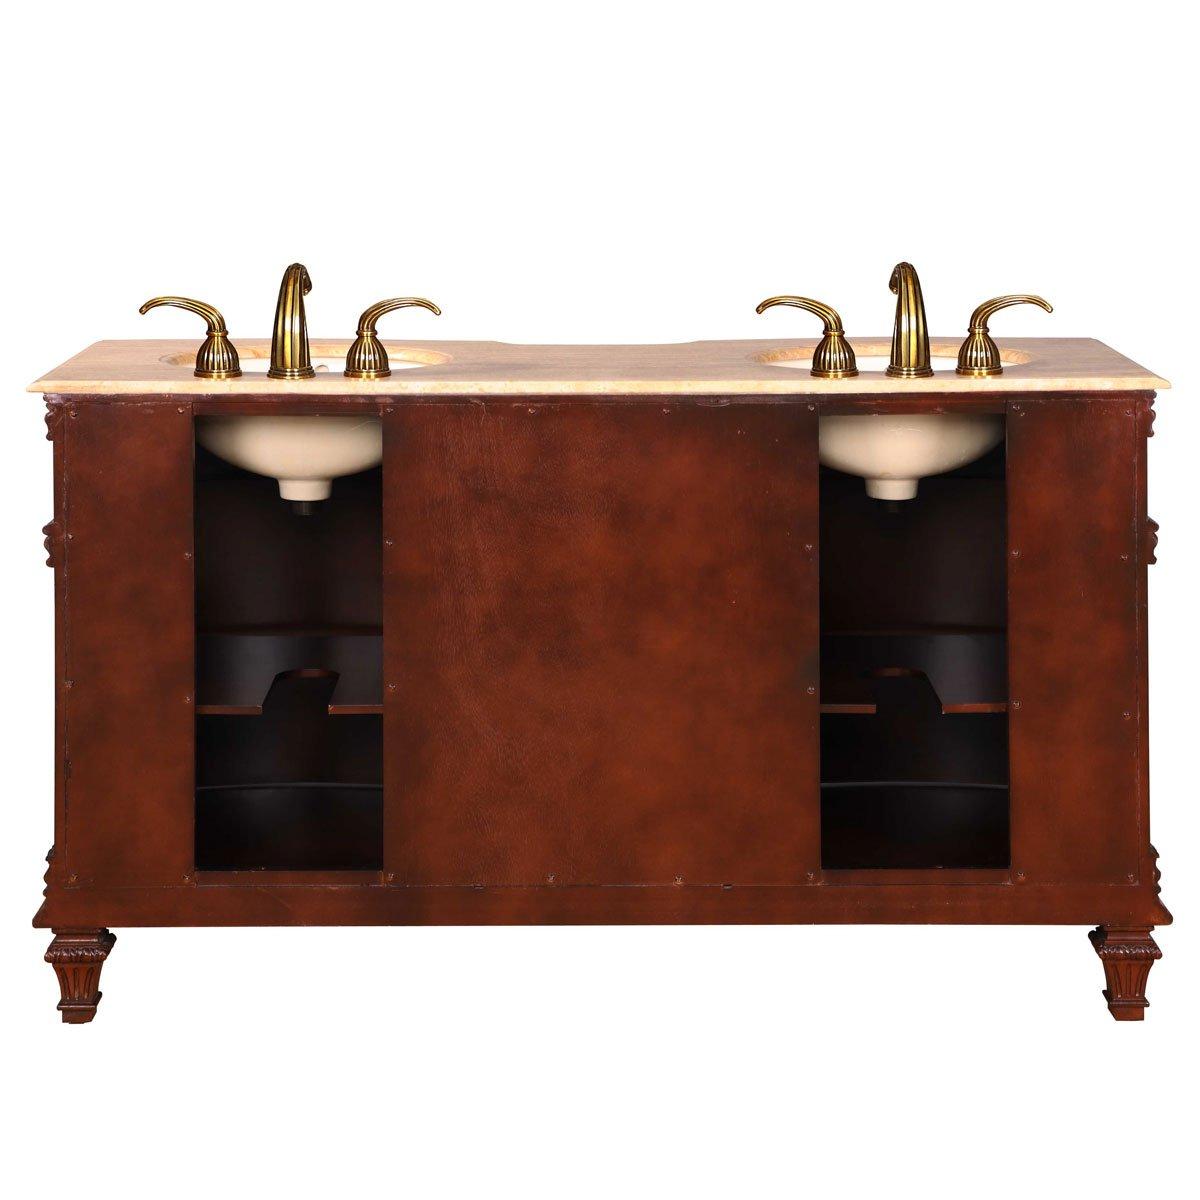 Amazon.com: Silkroad Exclusive Travertine Stone Top Double Sink ...